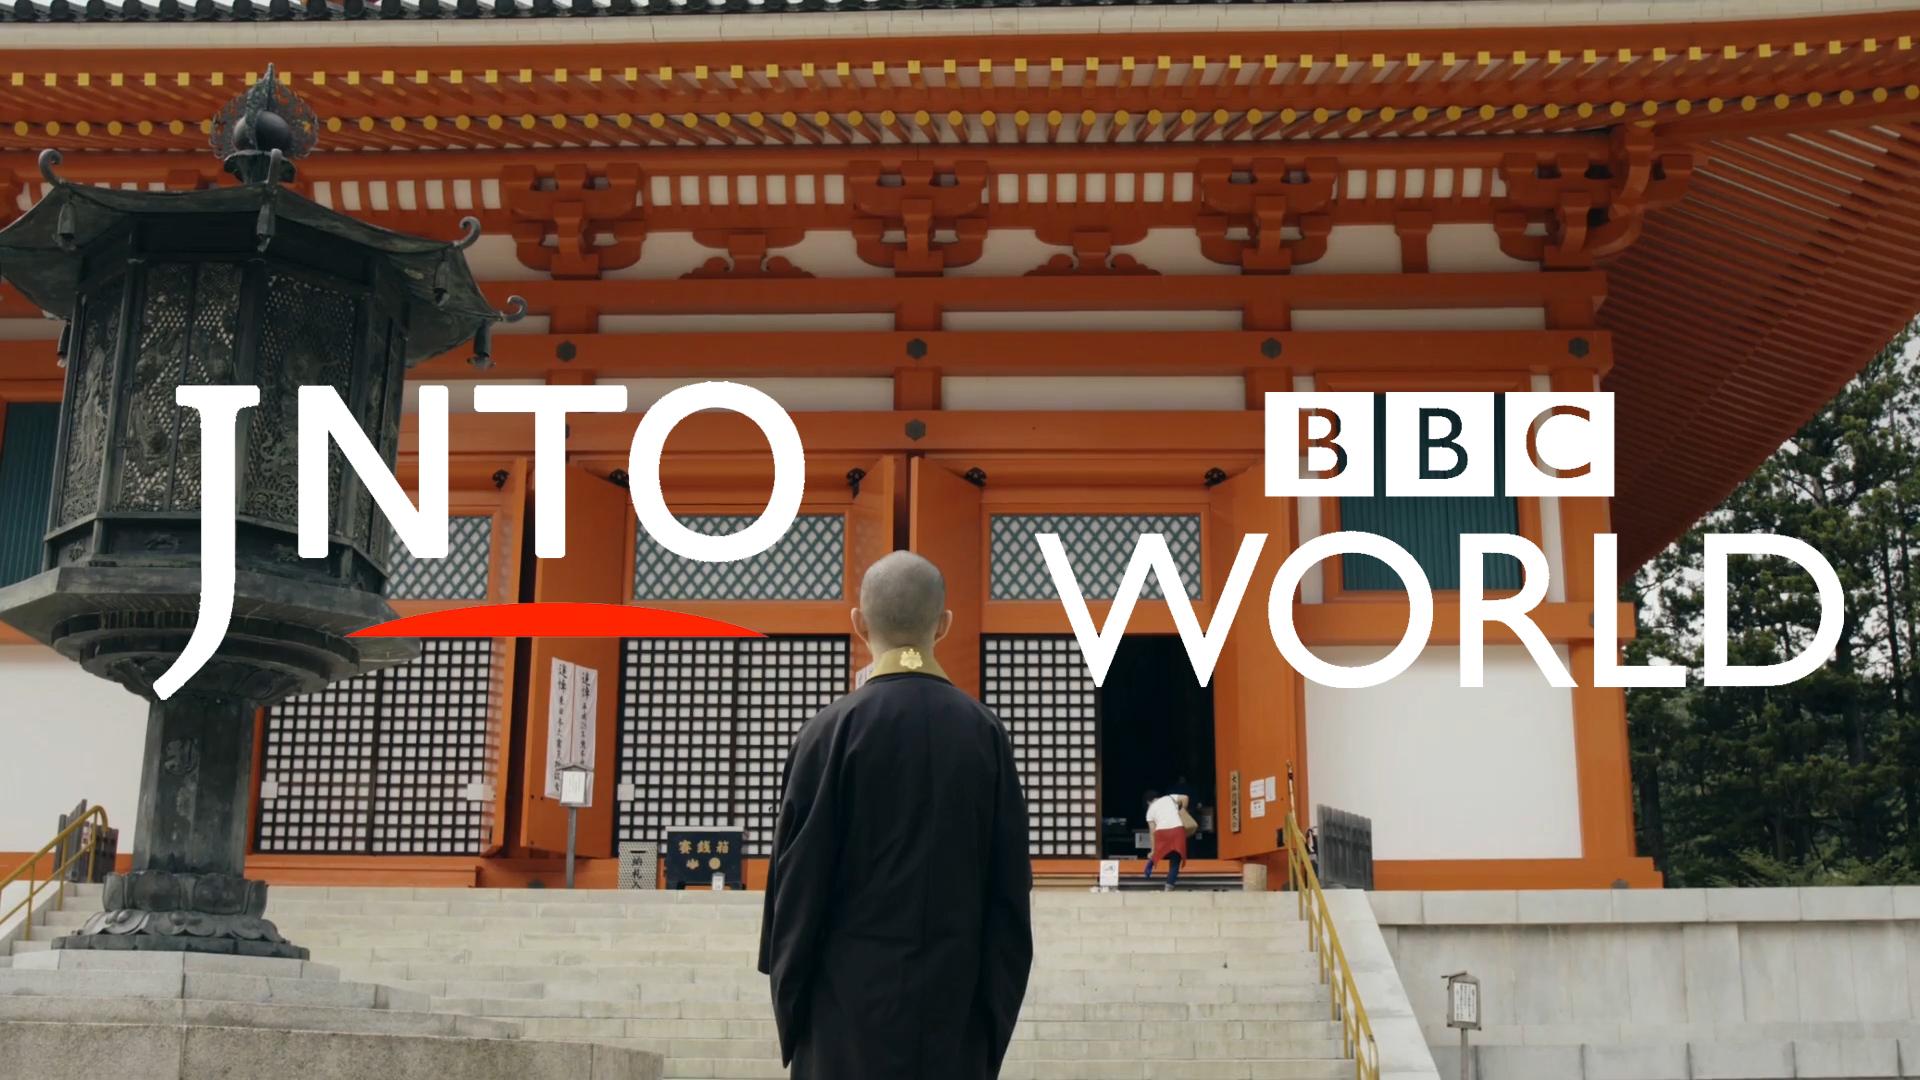 BBCWORLD_JNTO_THUMBNAIL.jpg